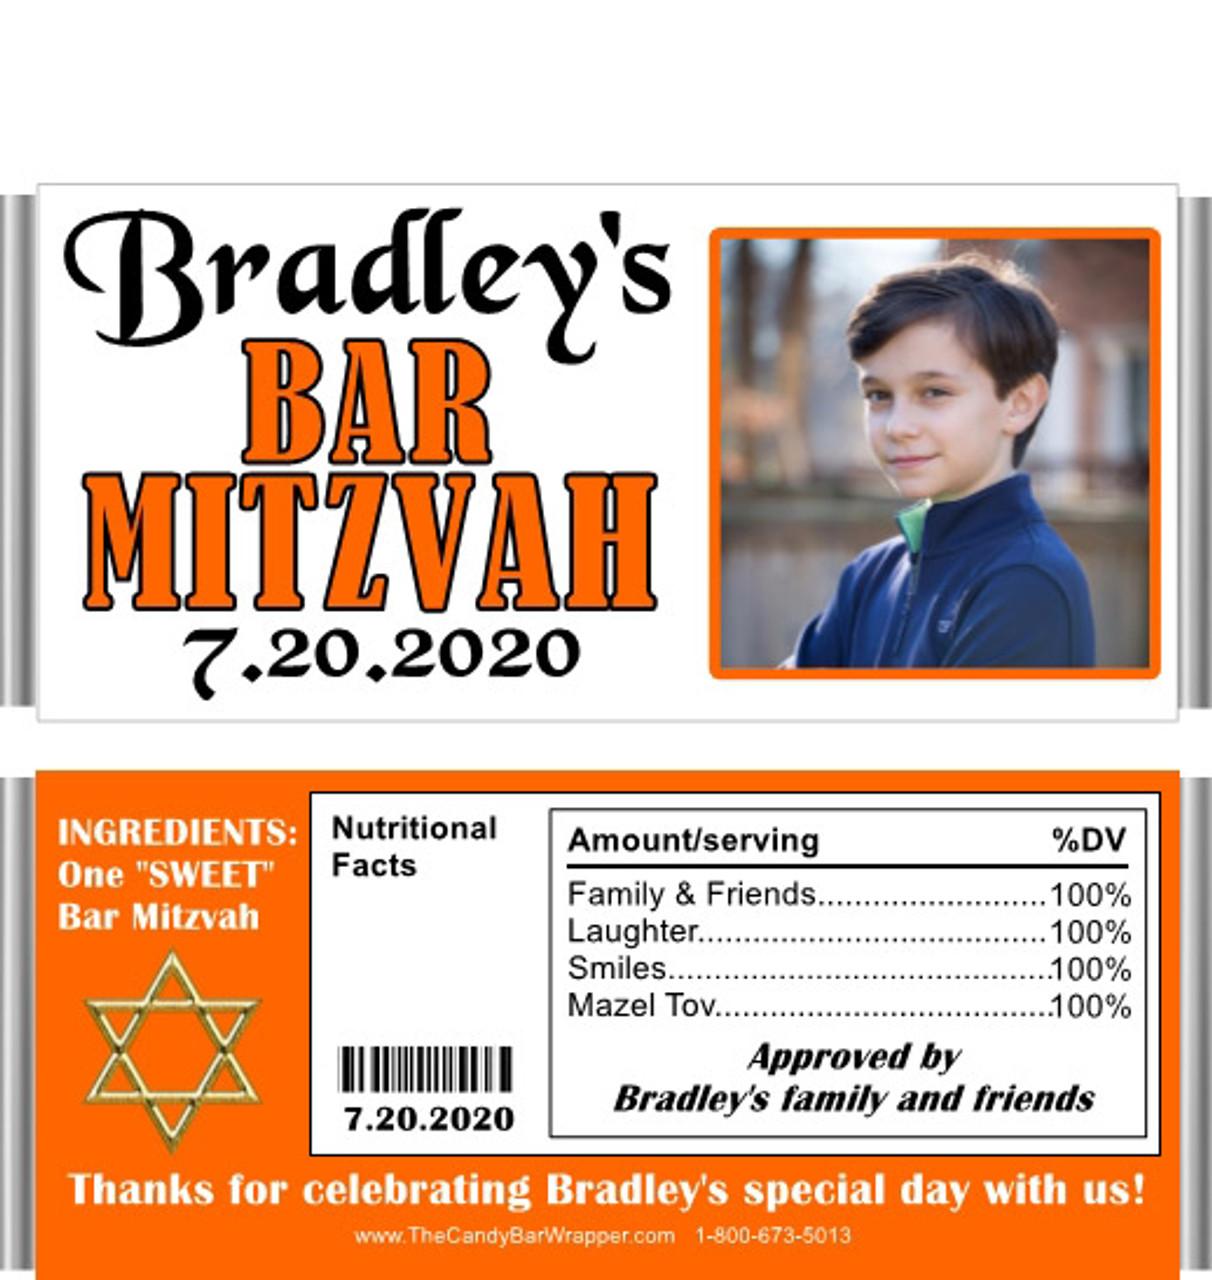 Bar Mitzvah Party Favors Bat Mitzvah Party Favors Custom Personalized Wedding Favors MINIMUM 100